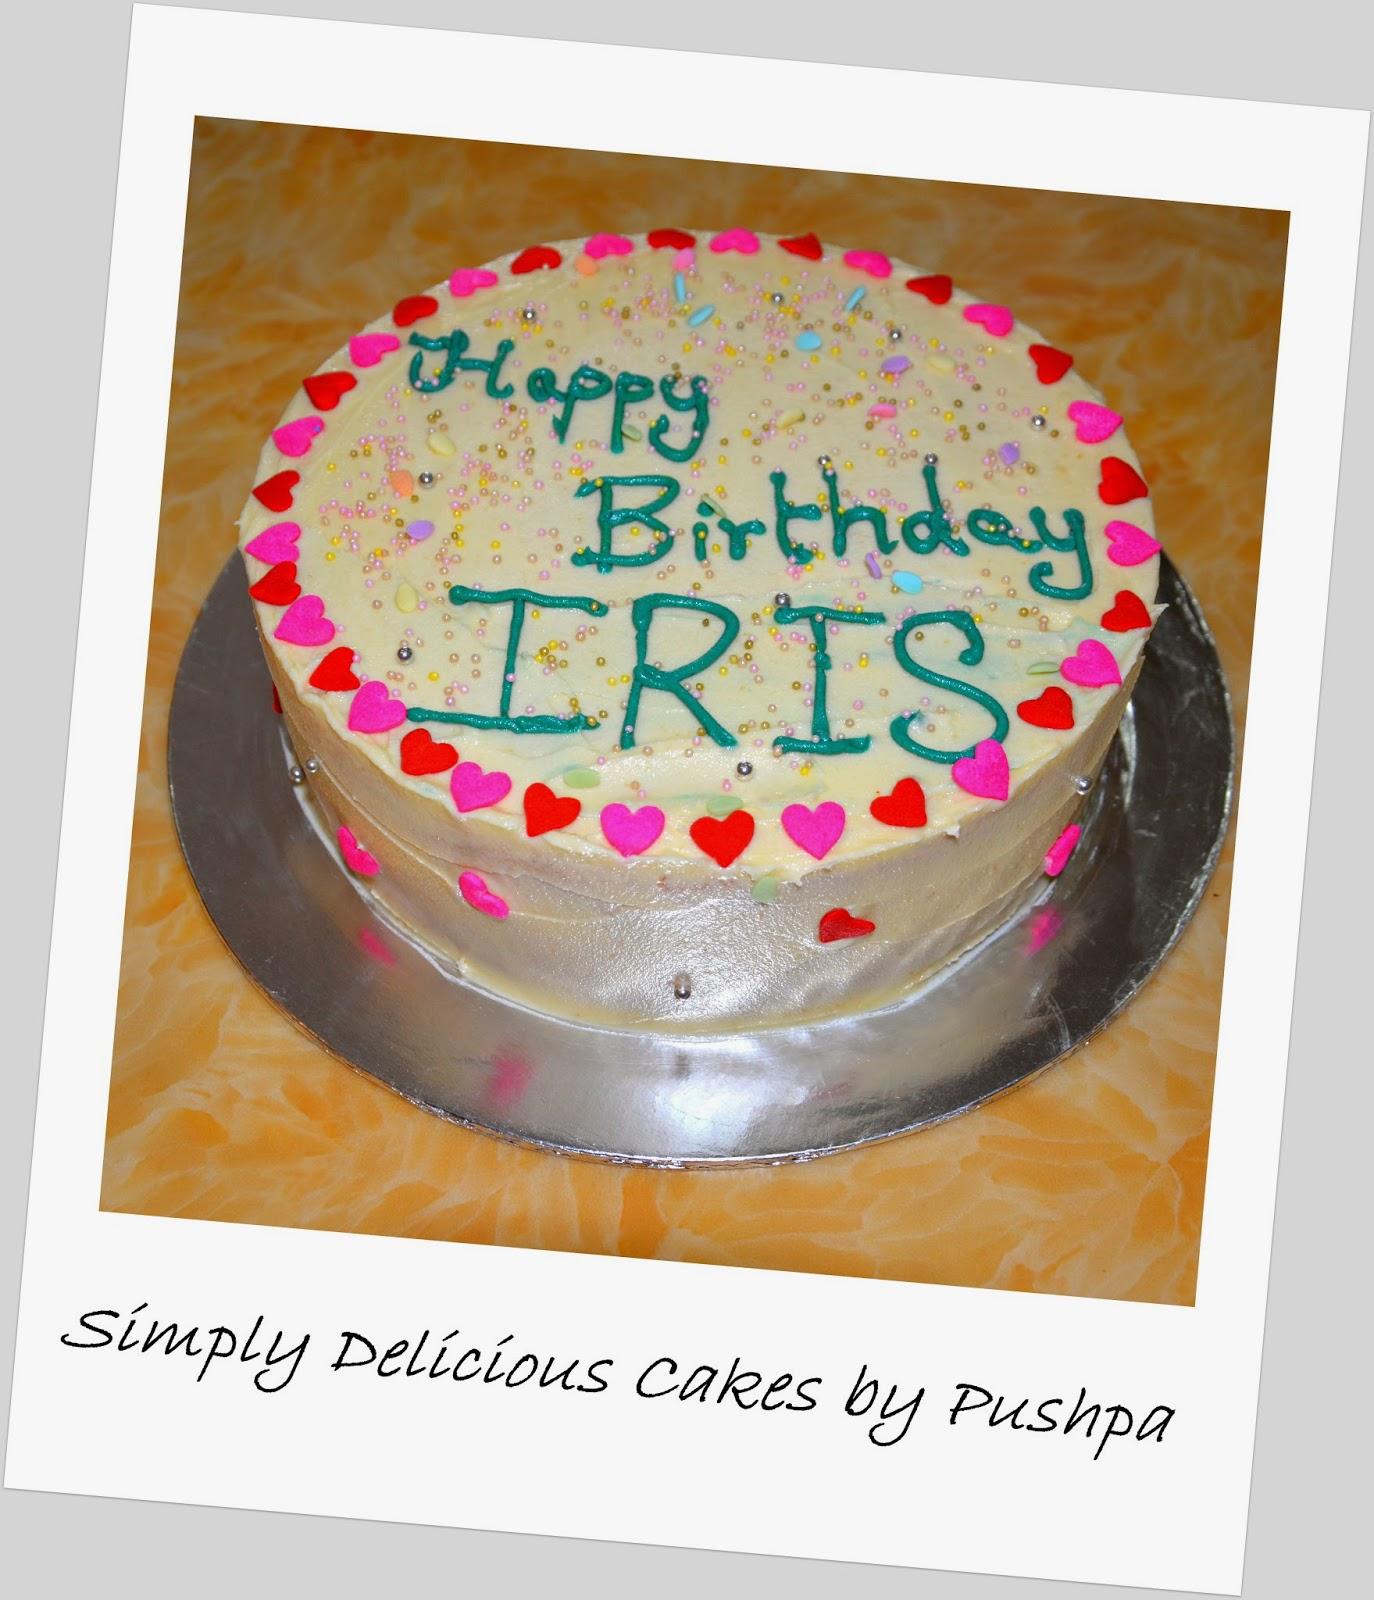 SIMPLY DELICIOUS CAKES: Birthday Cake